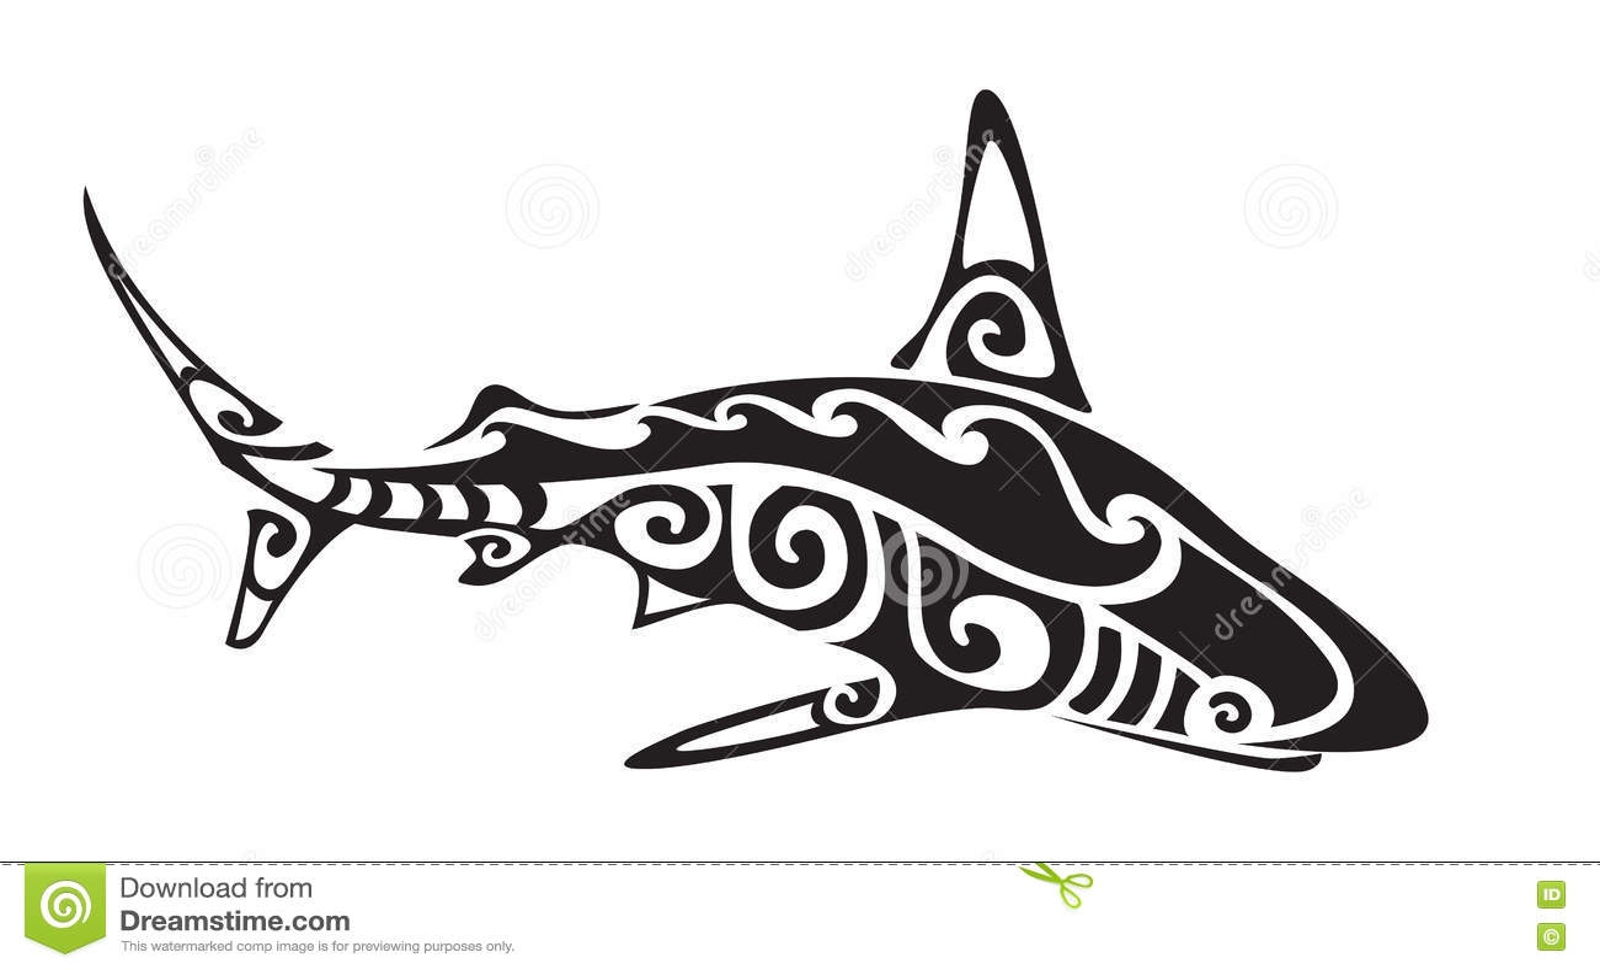 Polynesian decorative designs.